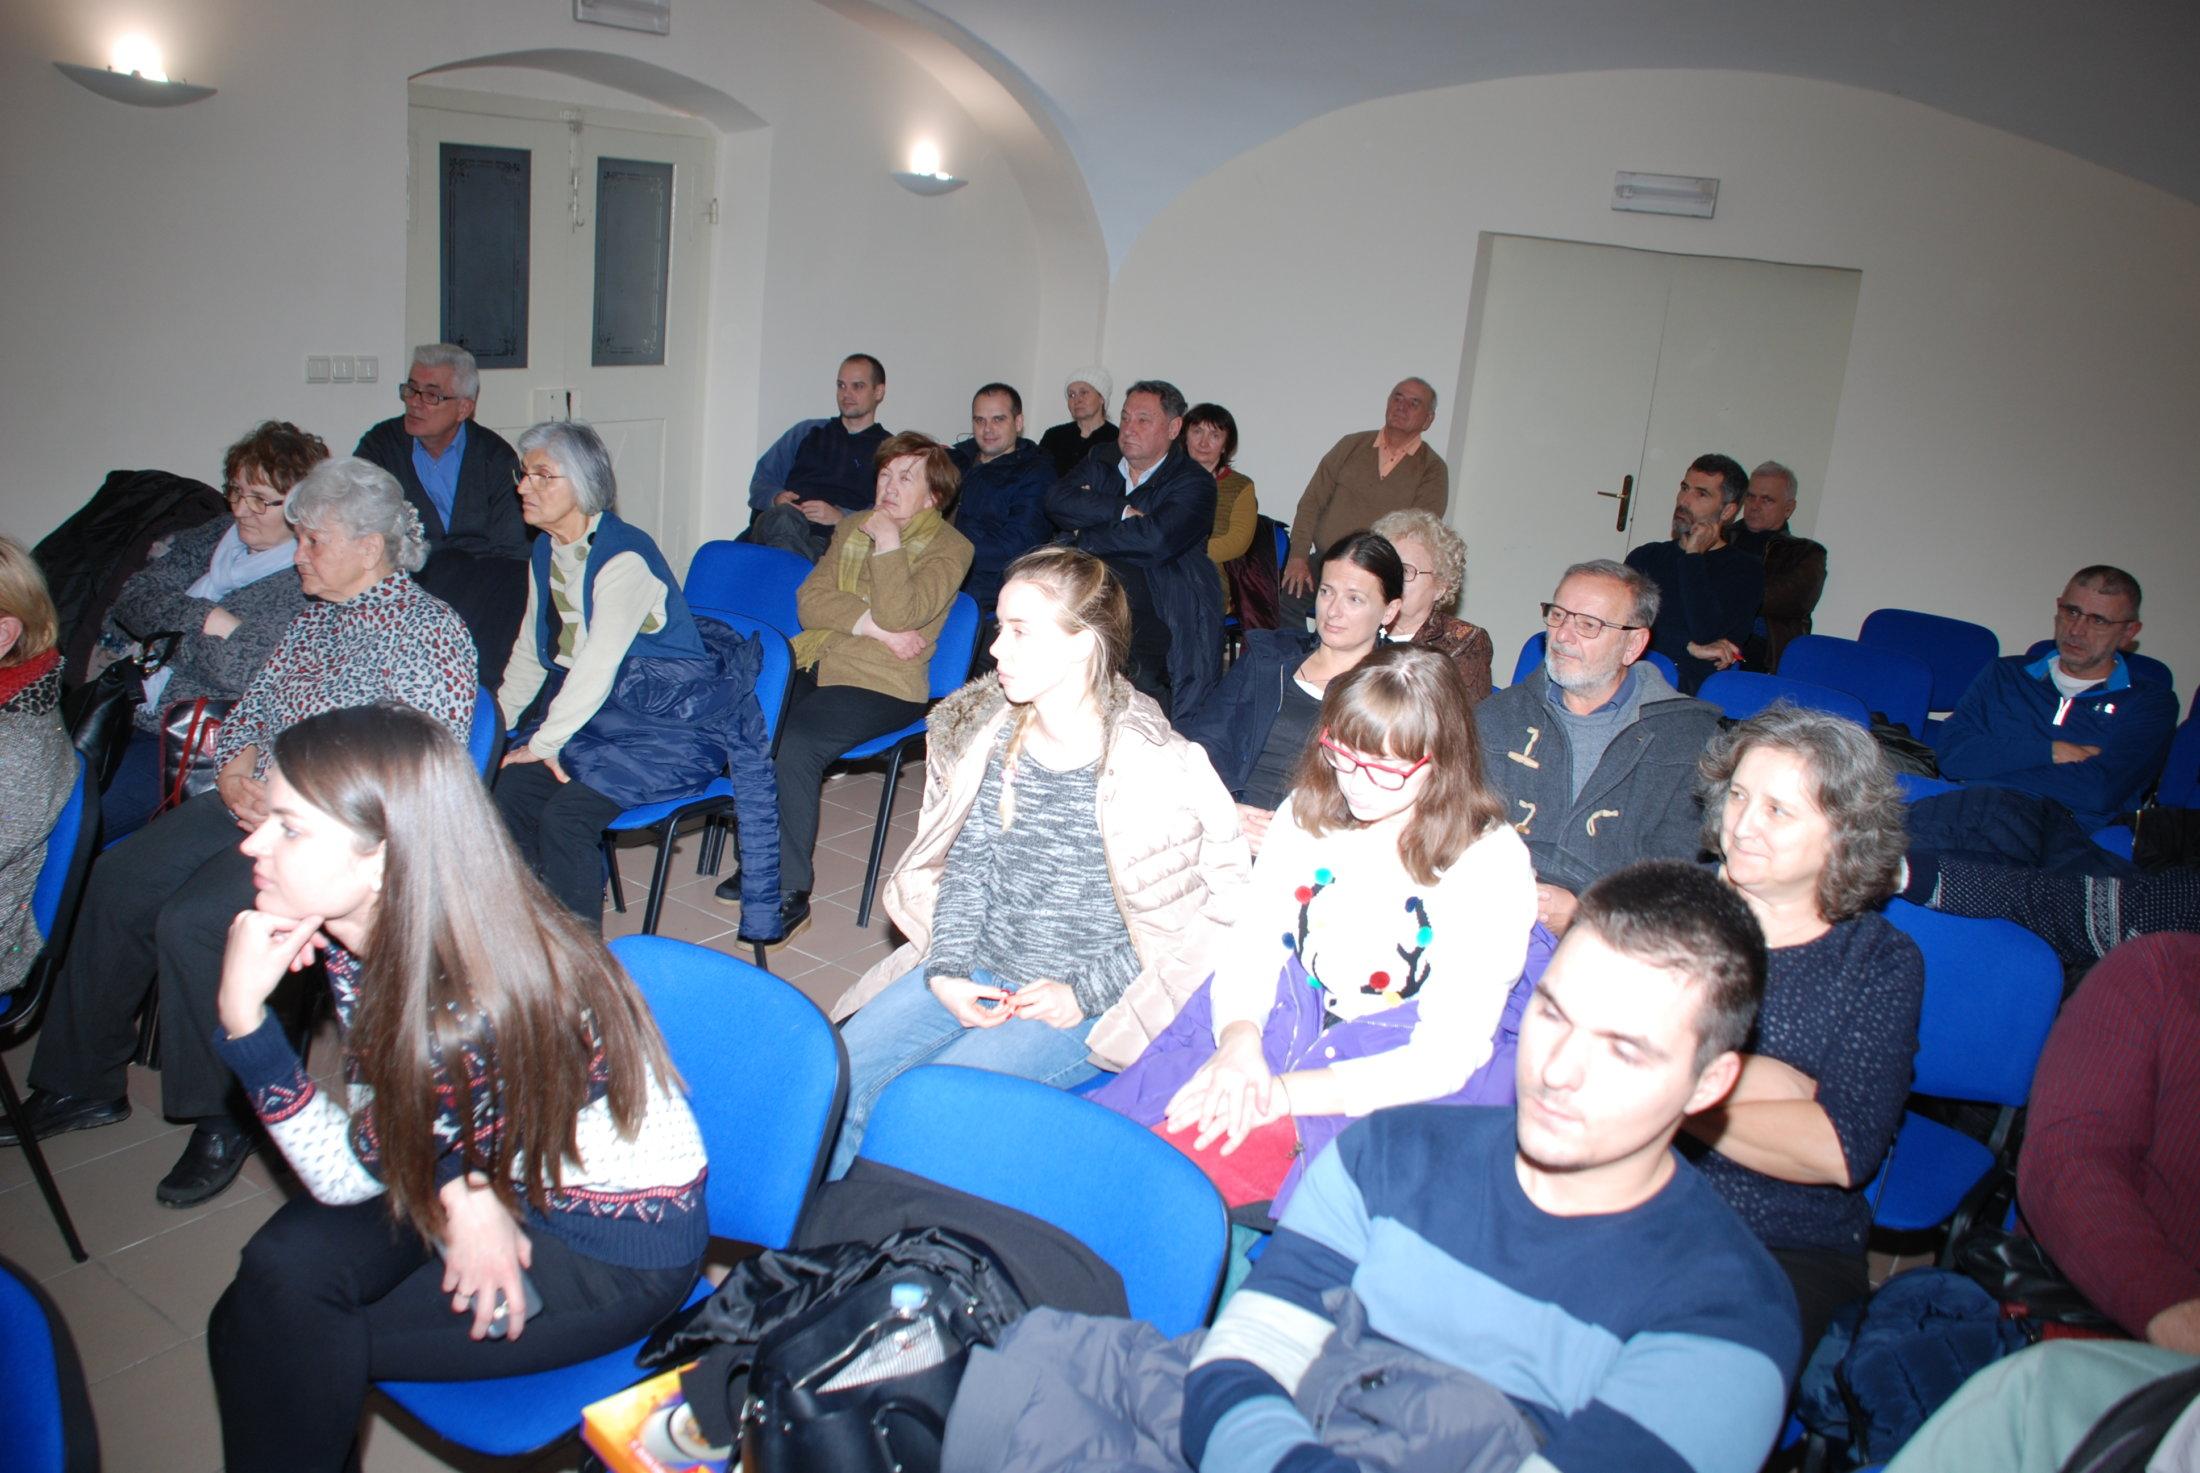 Publika Sluša Razgovor O Sv. Hildegardi, Osijek,23.12.19.